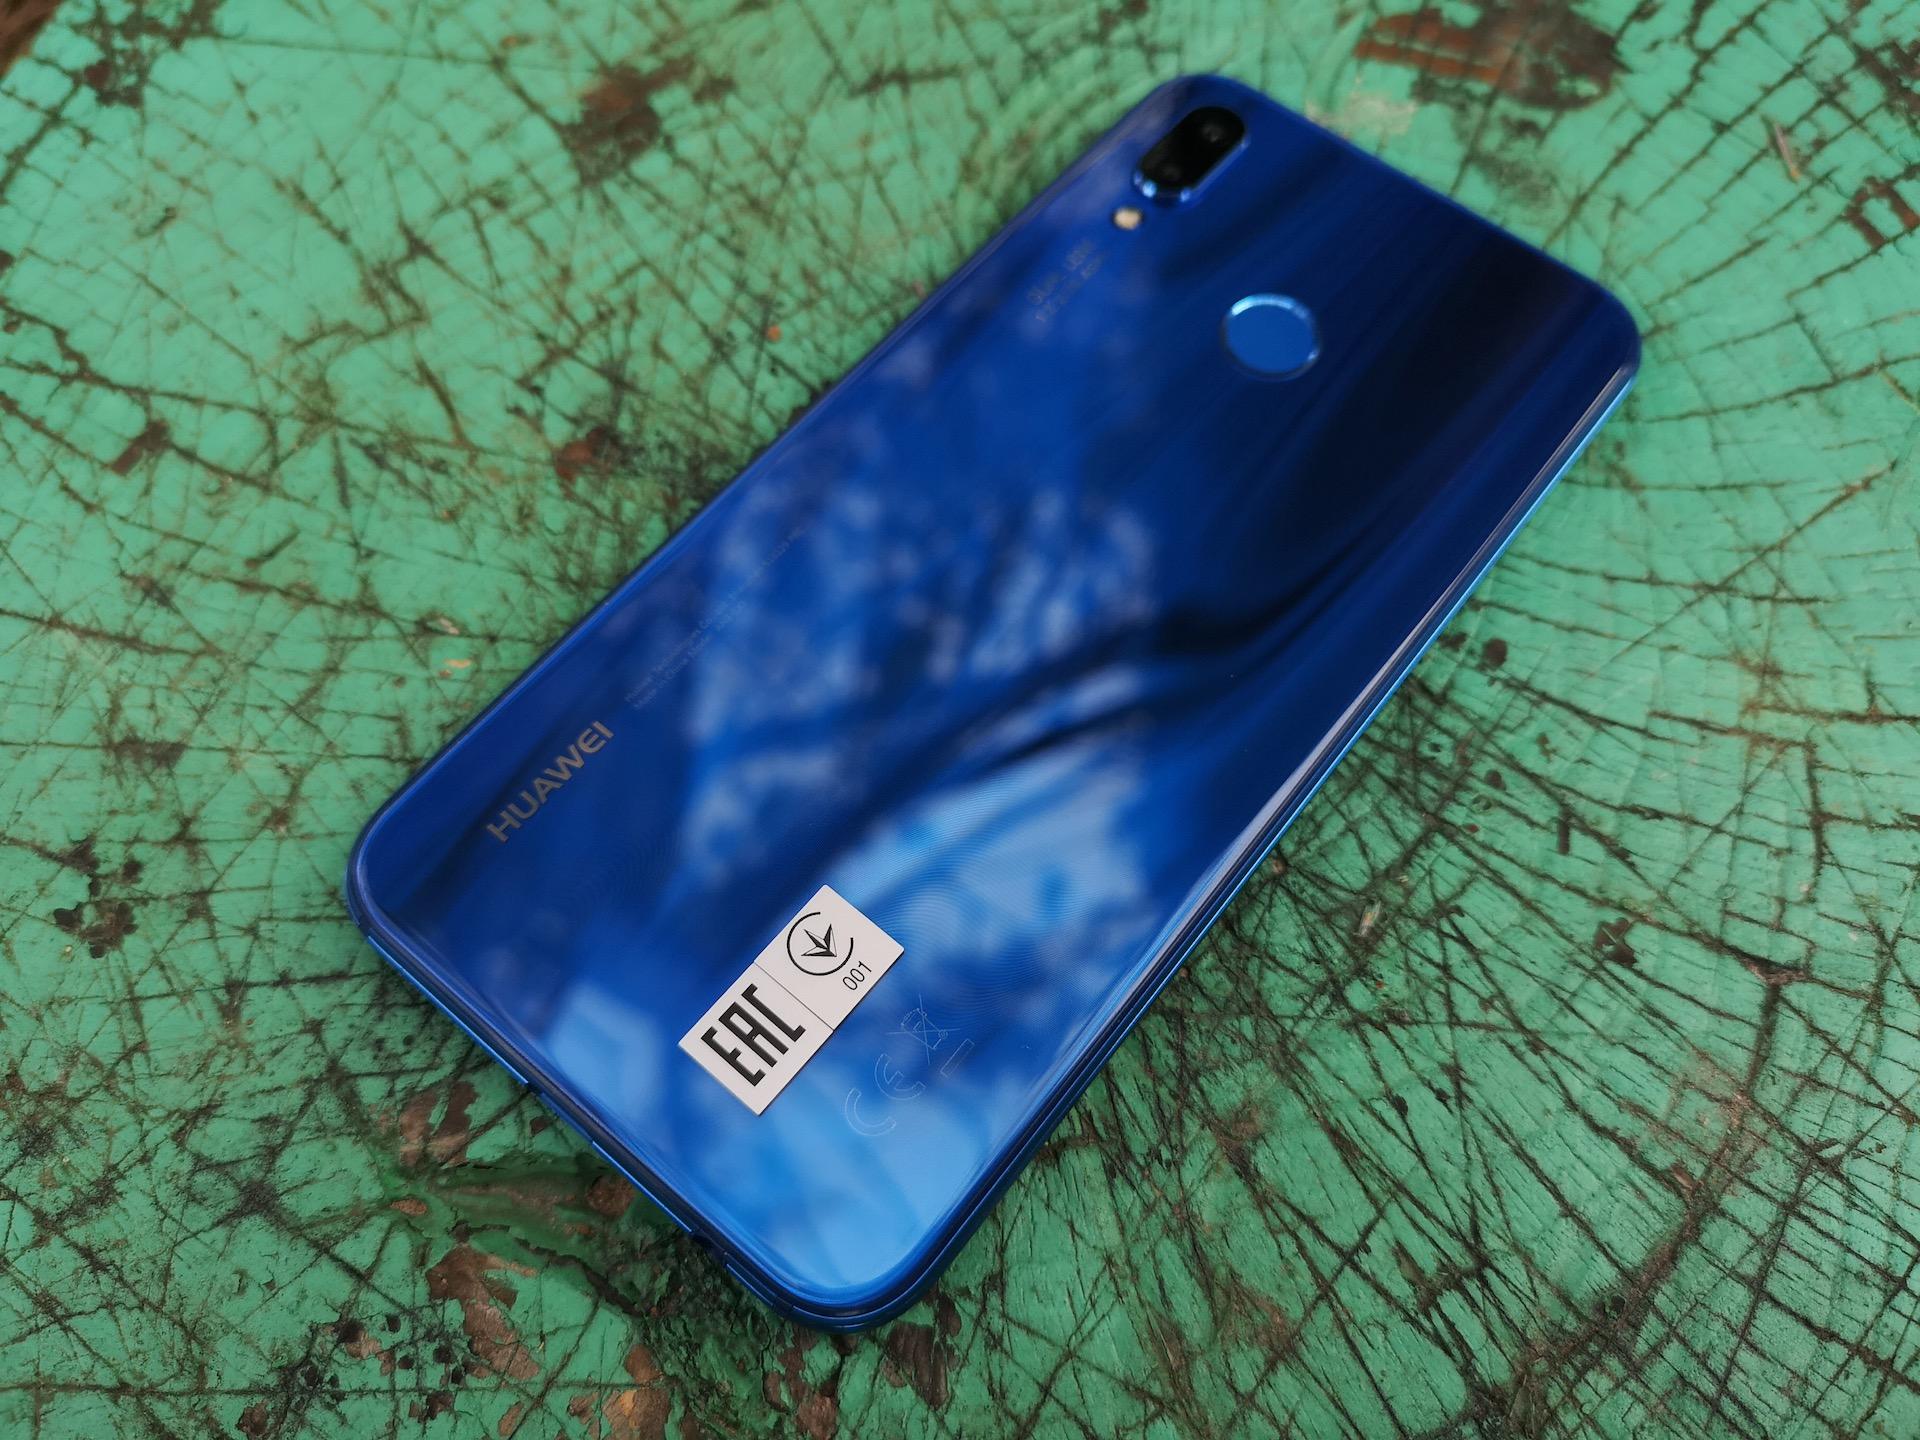 Обзор Huawei P20 Lite. Младший из флагманов